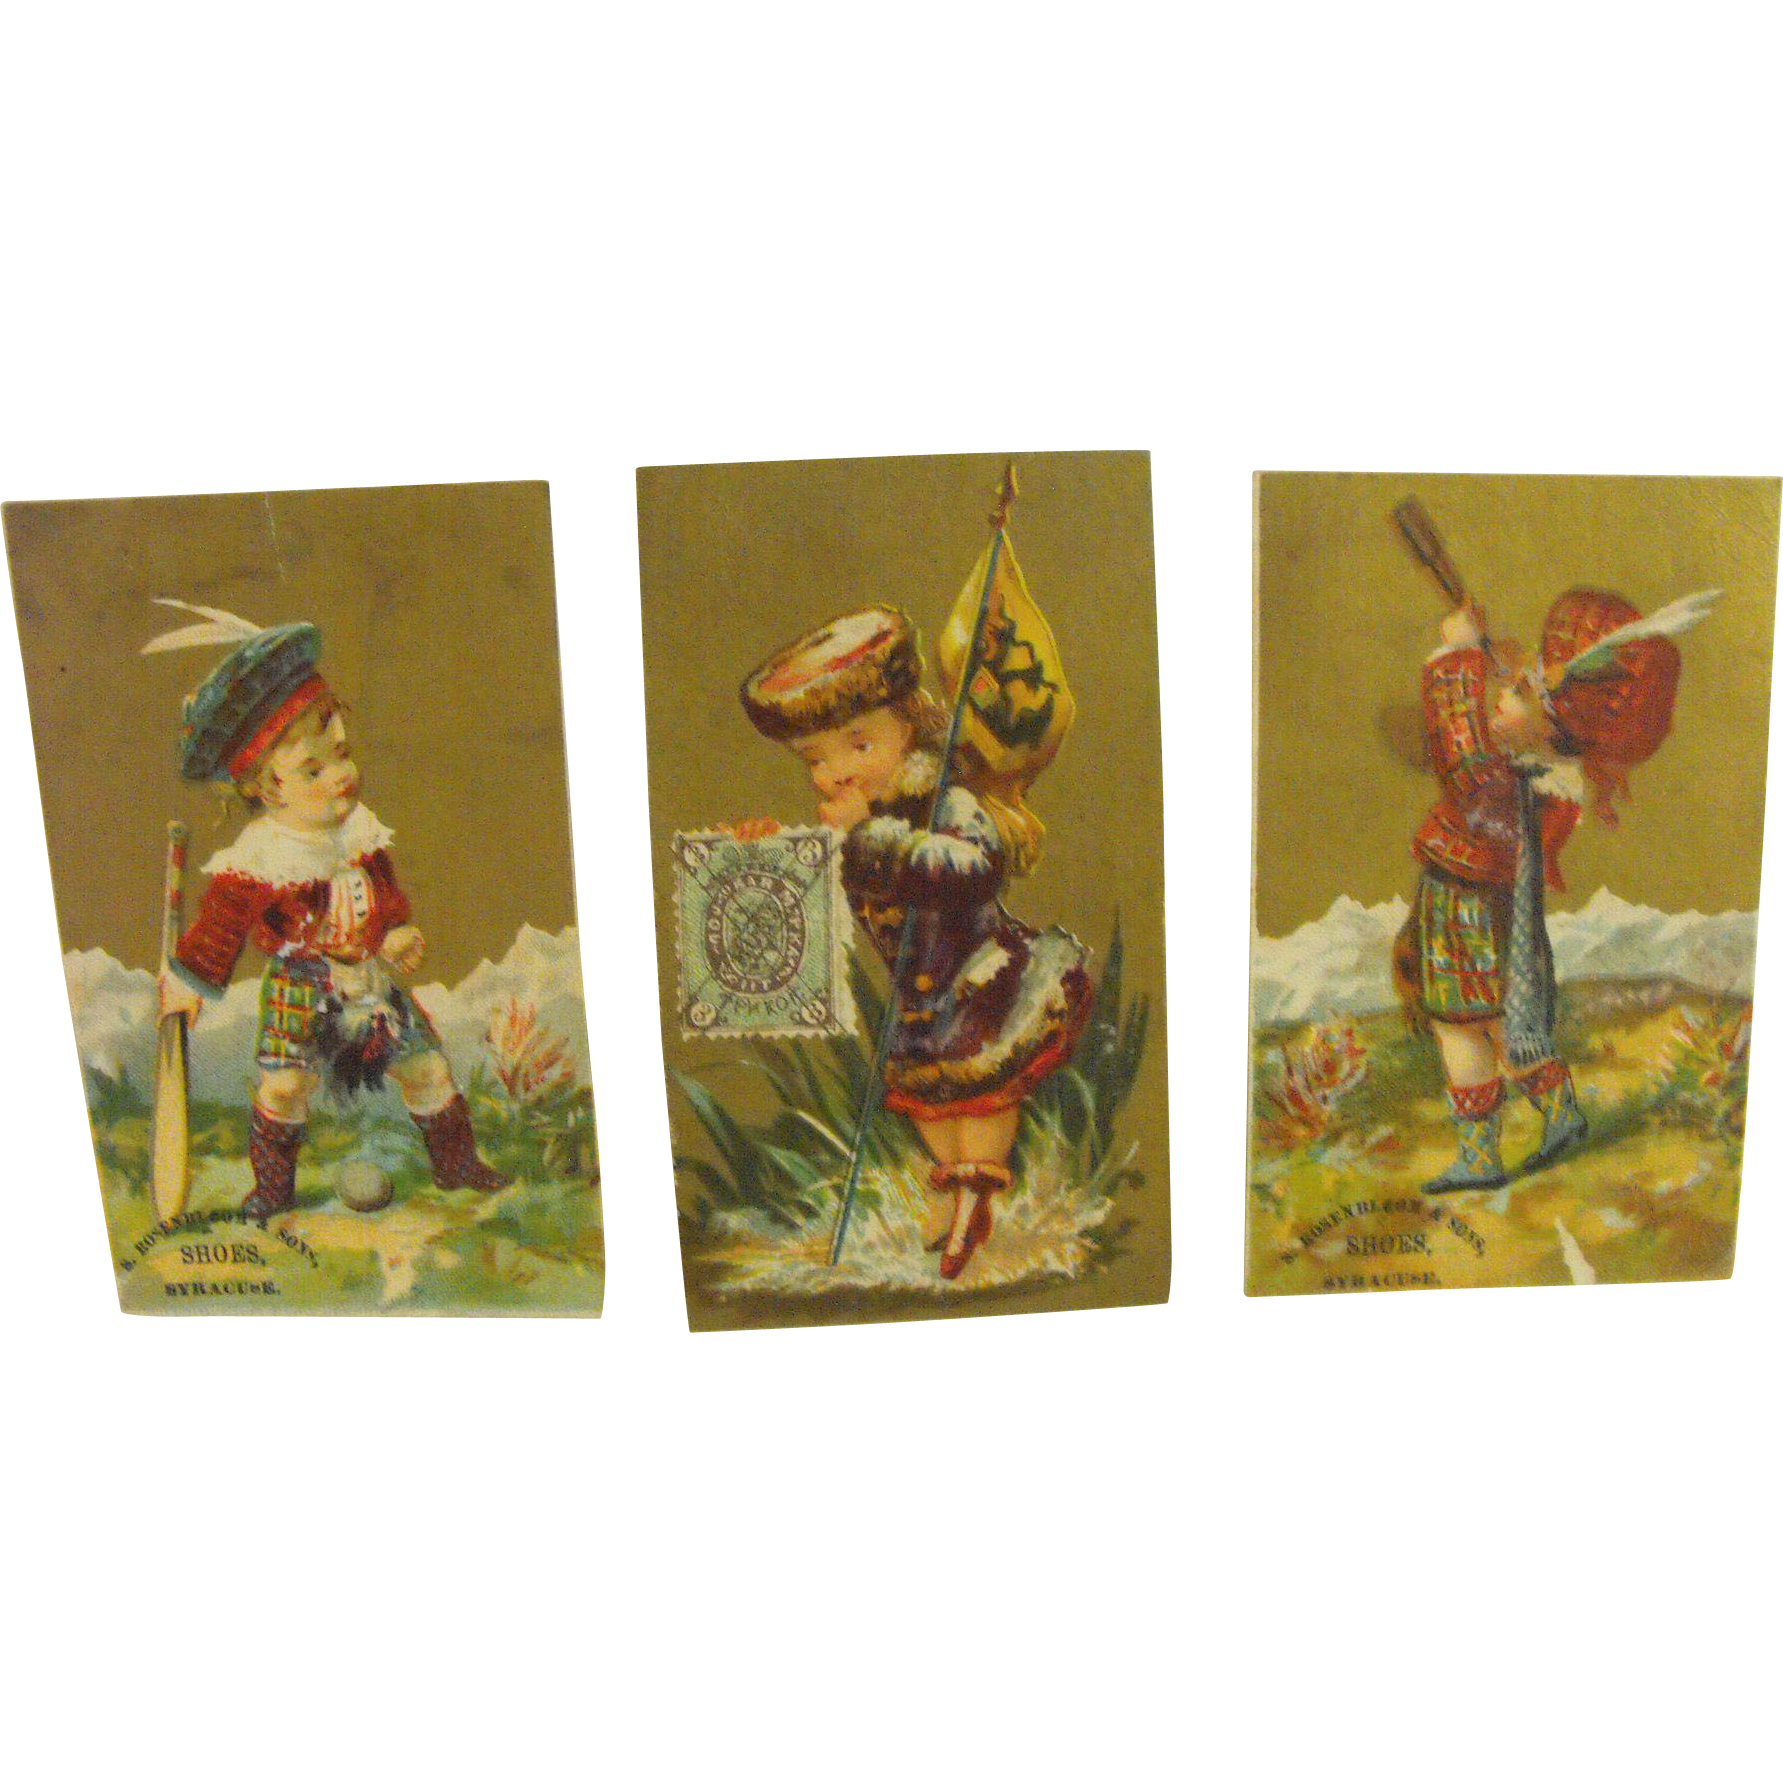 19th Century Trade Cards (3)